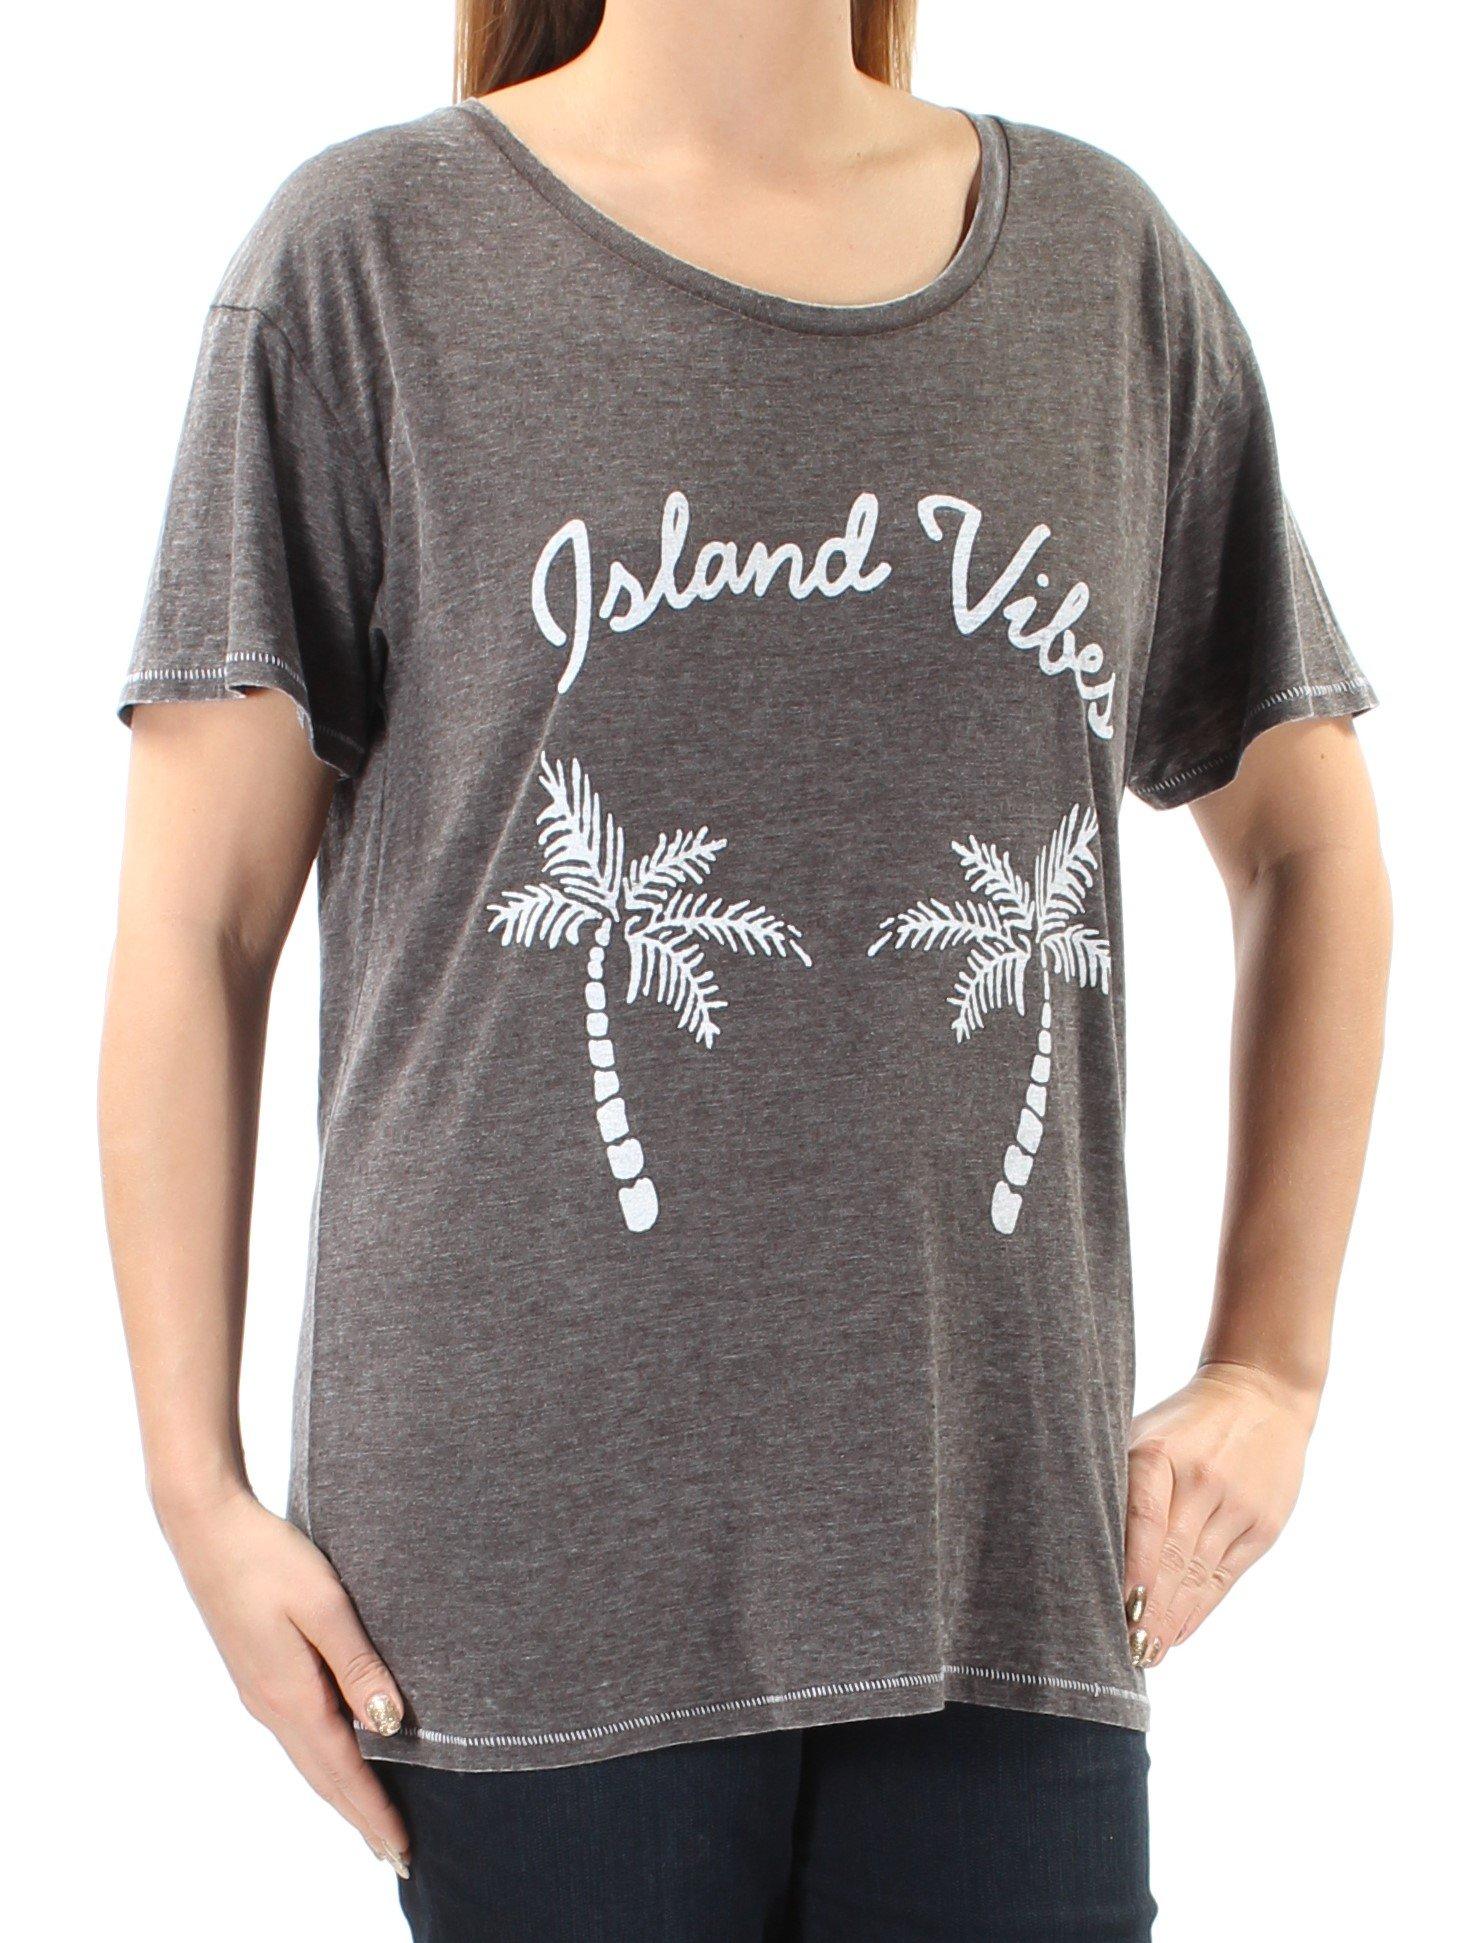 Island Vibes Tee 7425 Shirts